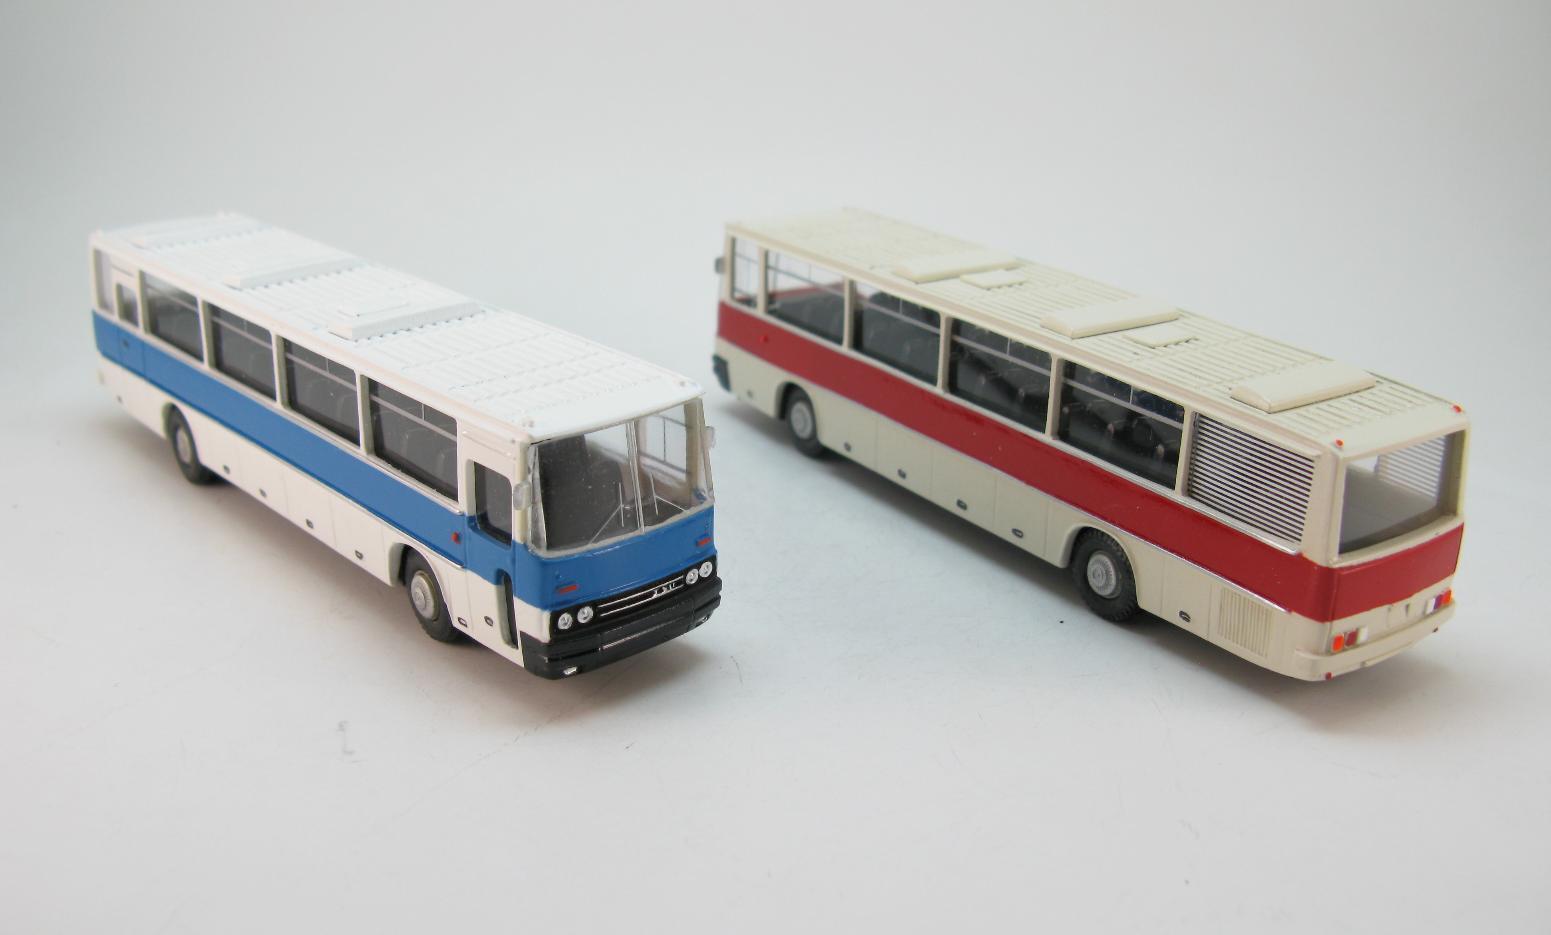 Ikarus 250.58 Intercity-bus 1984 rda urss - 1 87 Ho